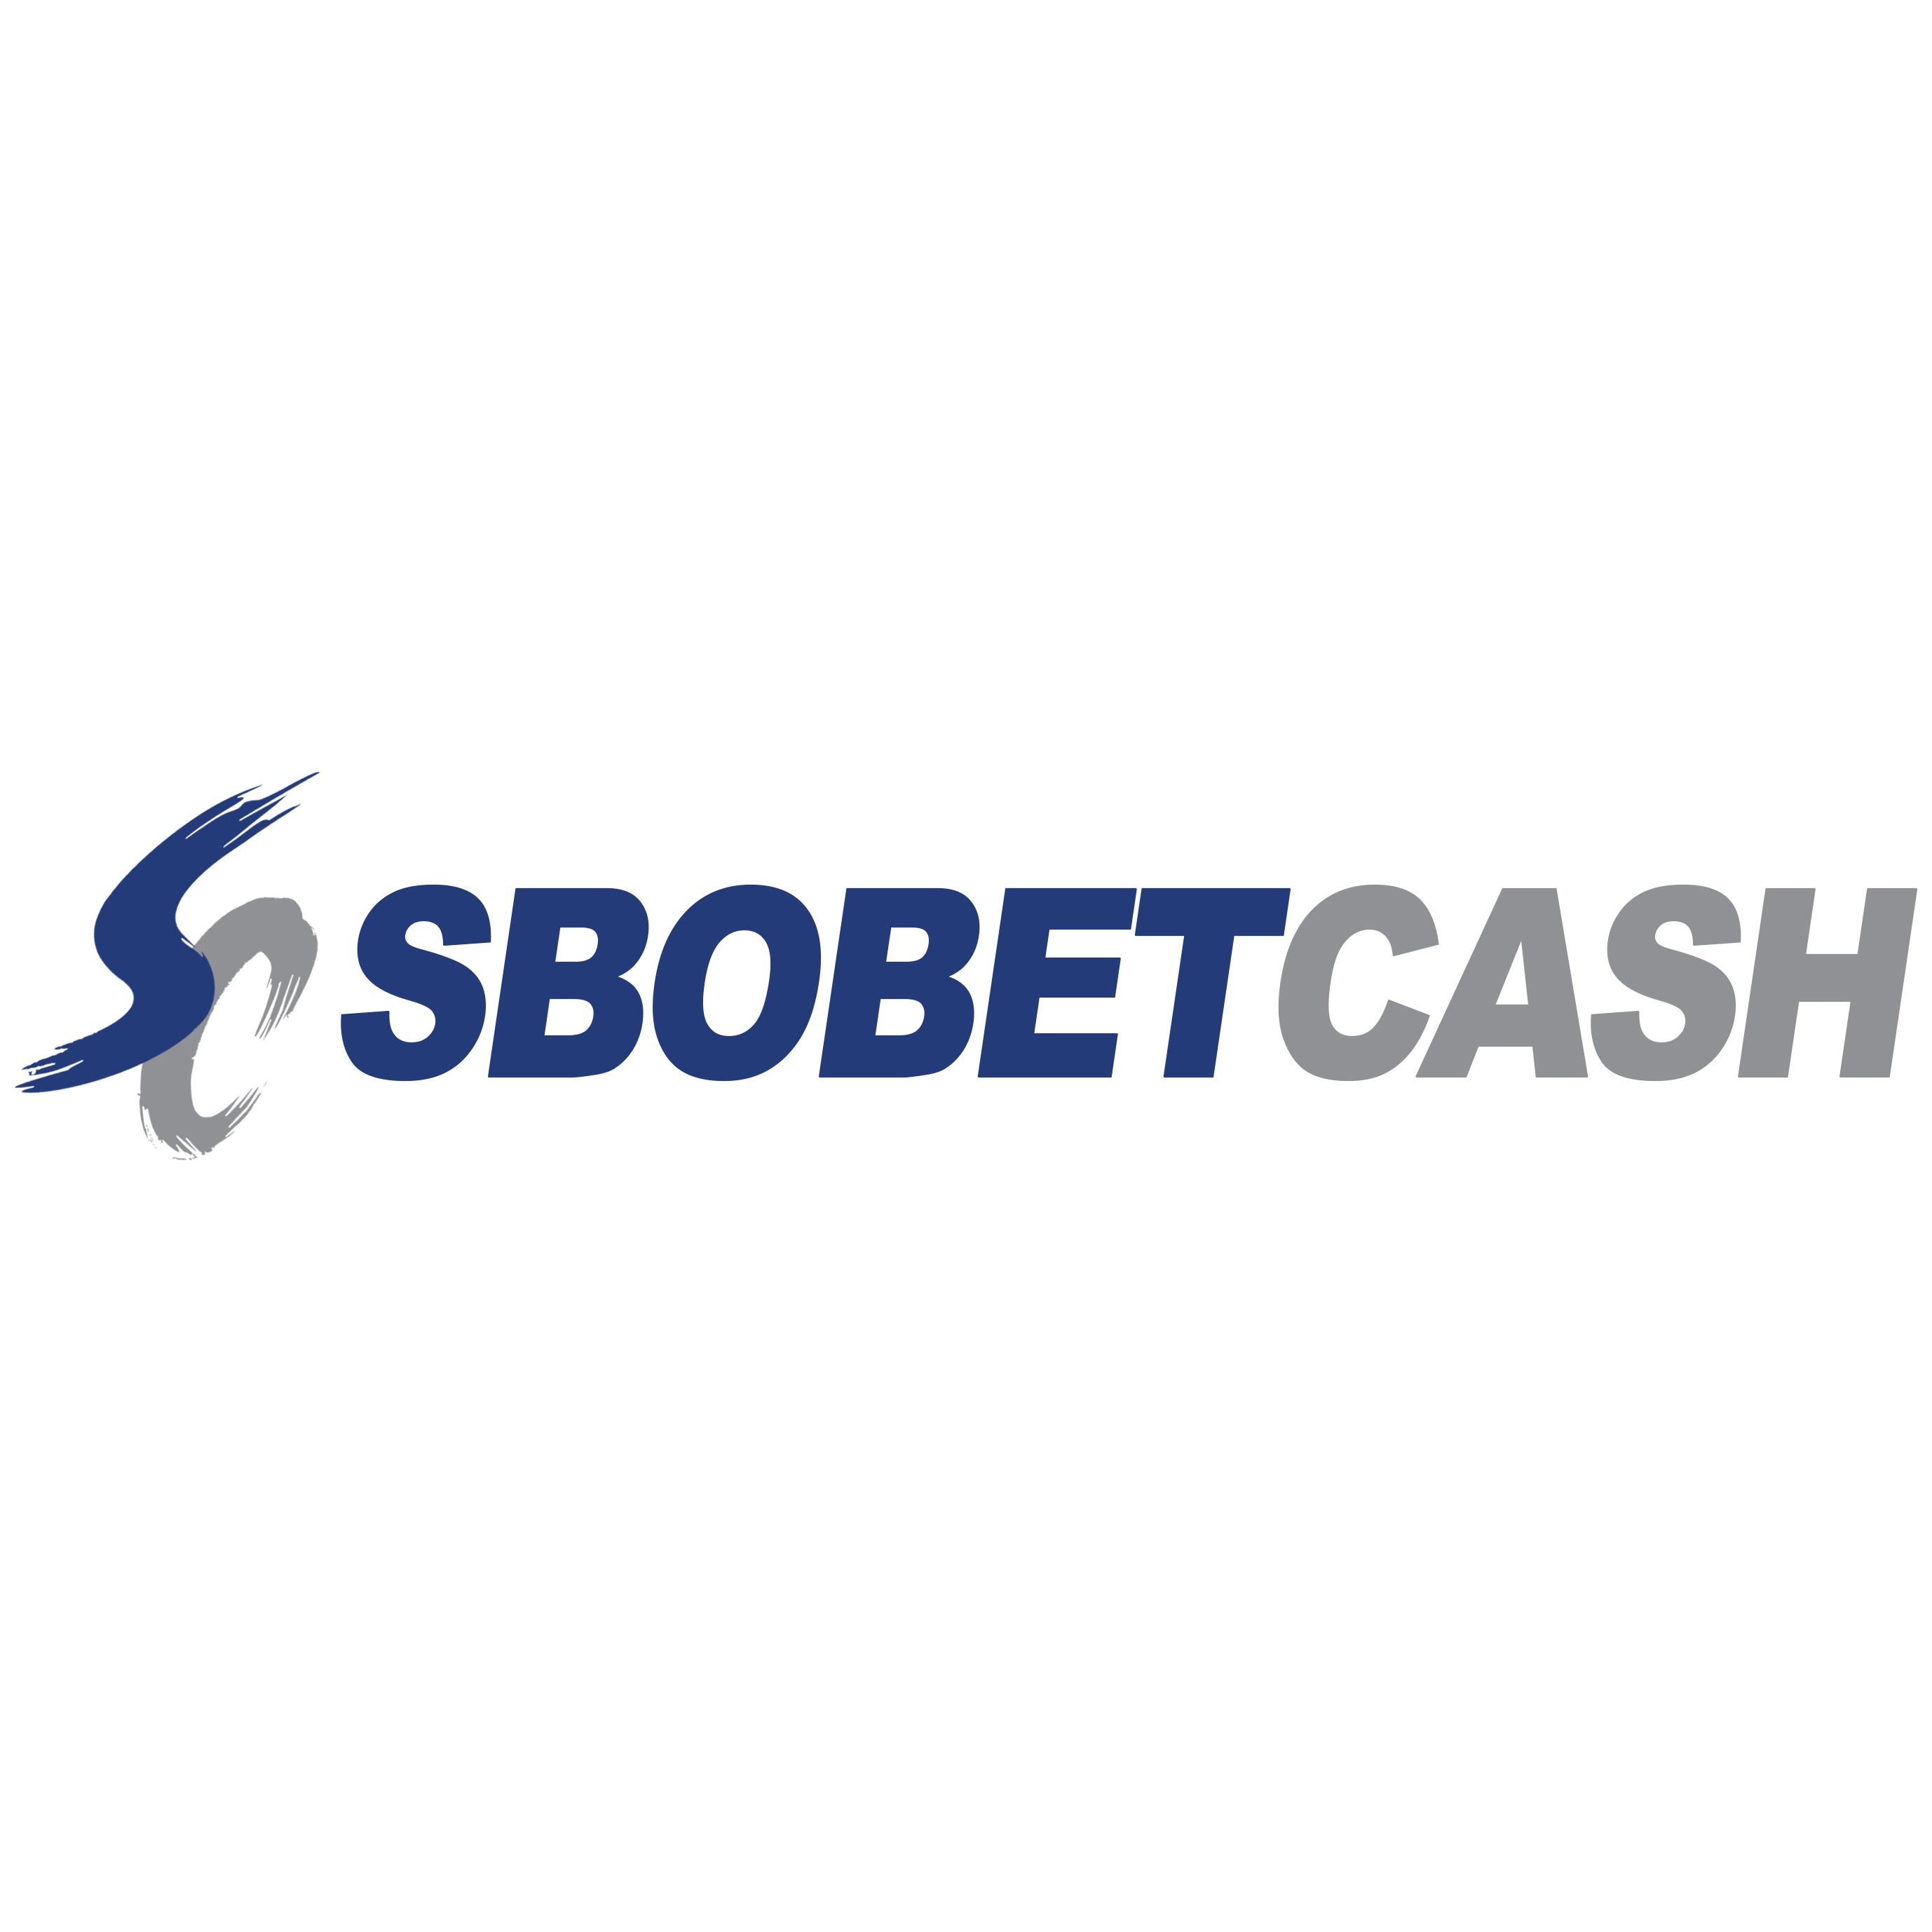 Sbobetcash: Situs Sbobet Resmi (sbobetcash) Profile Image | Linktree